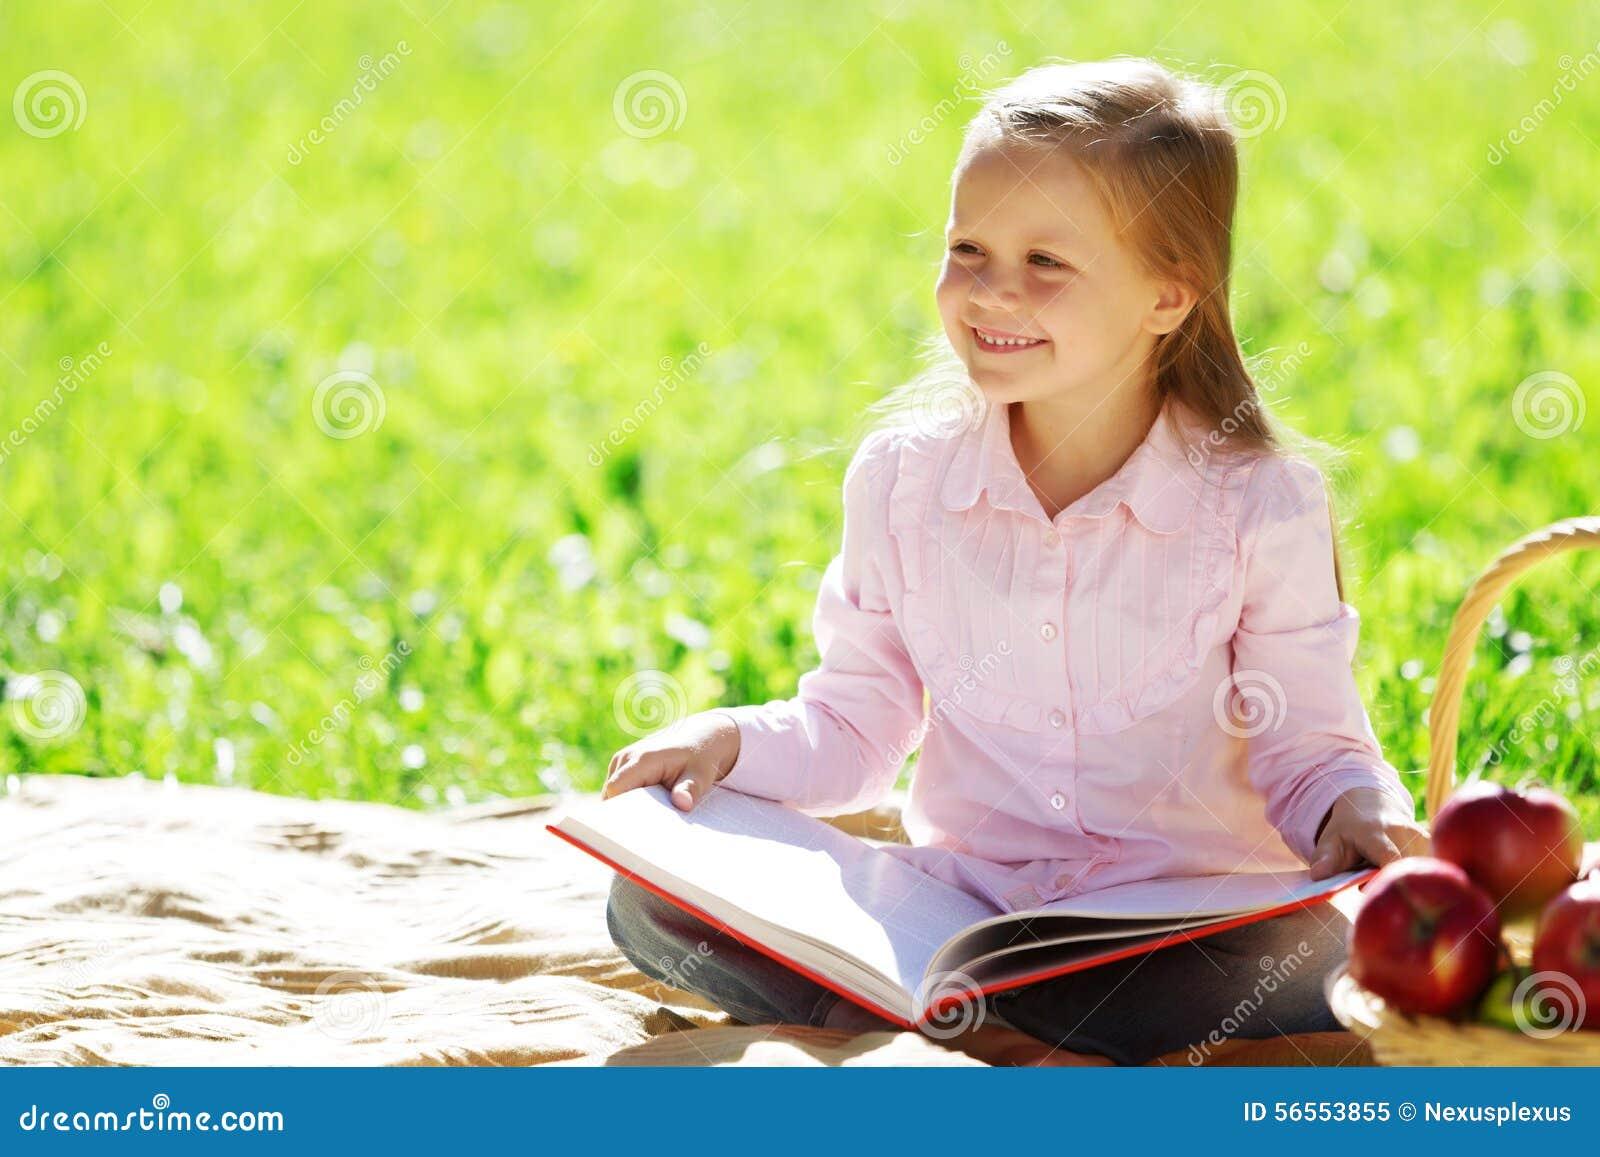 Download Κορίτσι στο πάρκο στοκ εικόνα. εικόνα από ευτυχής, διασκέδαση - 56553855